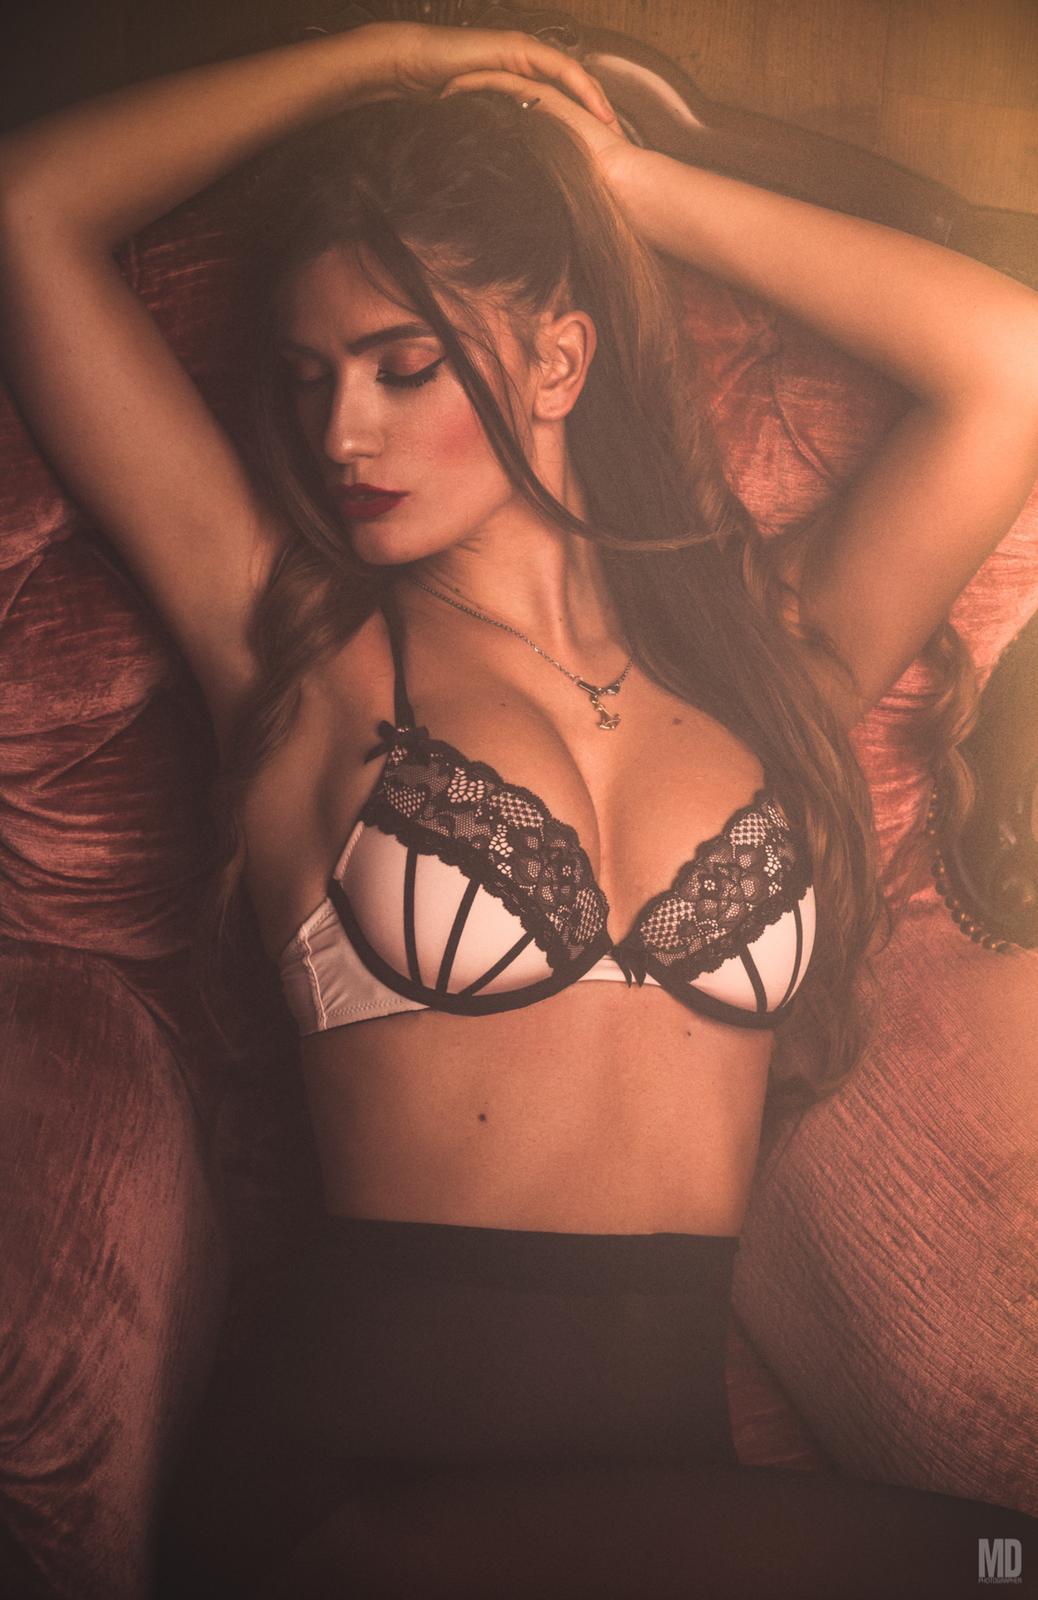 Categorie: Boudoir & Nude, Glamour, Portrait; Model: DORA STELLA - Photographers: NICO RUFFATO, LUCA CLERICI, MARIO DOSI, SIRIO SERUGHETTI, SHAUN STUBLEY - Location: Milano, MI, Italia